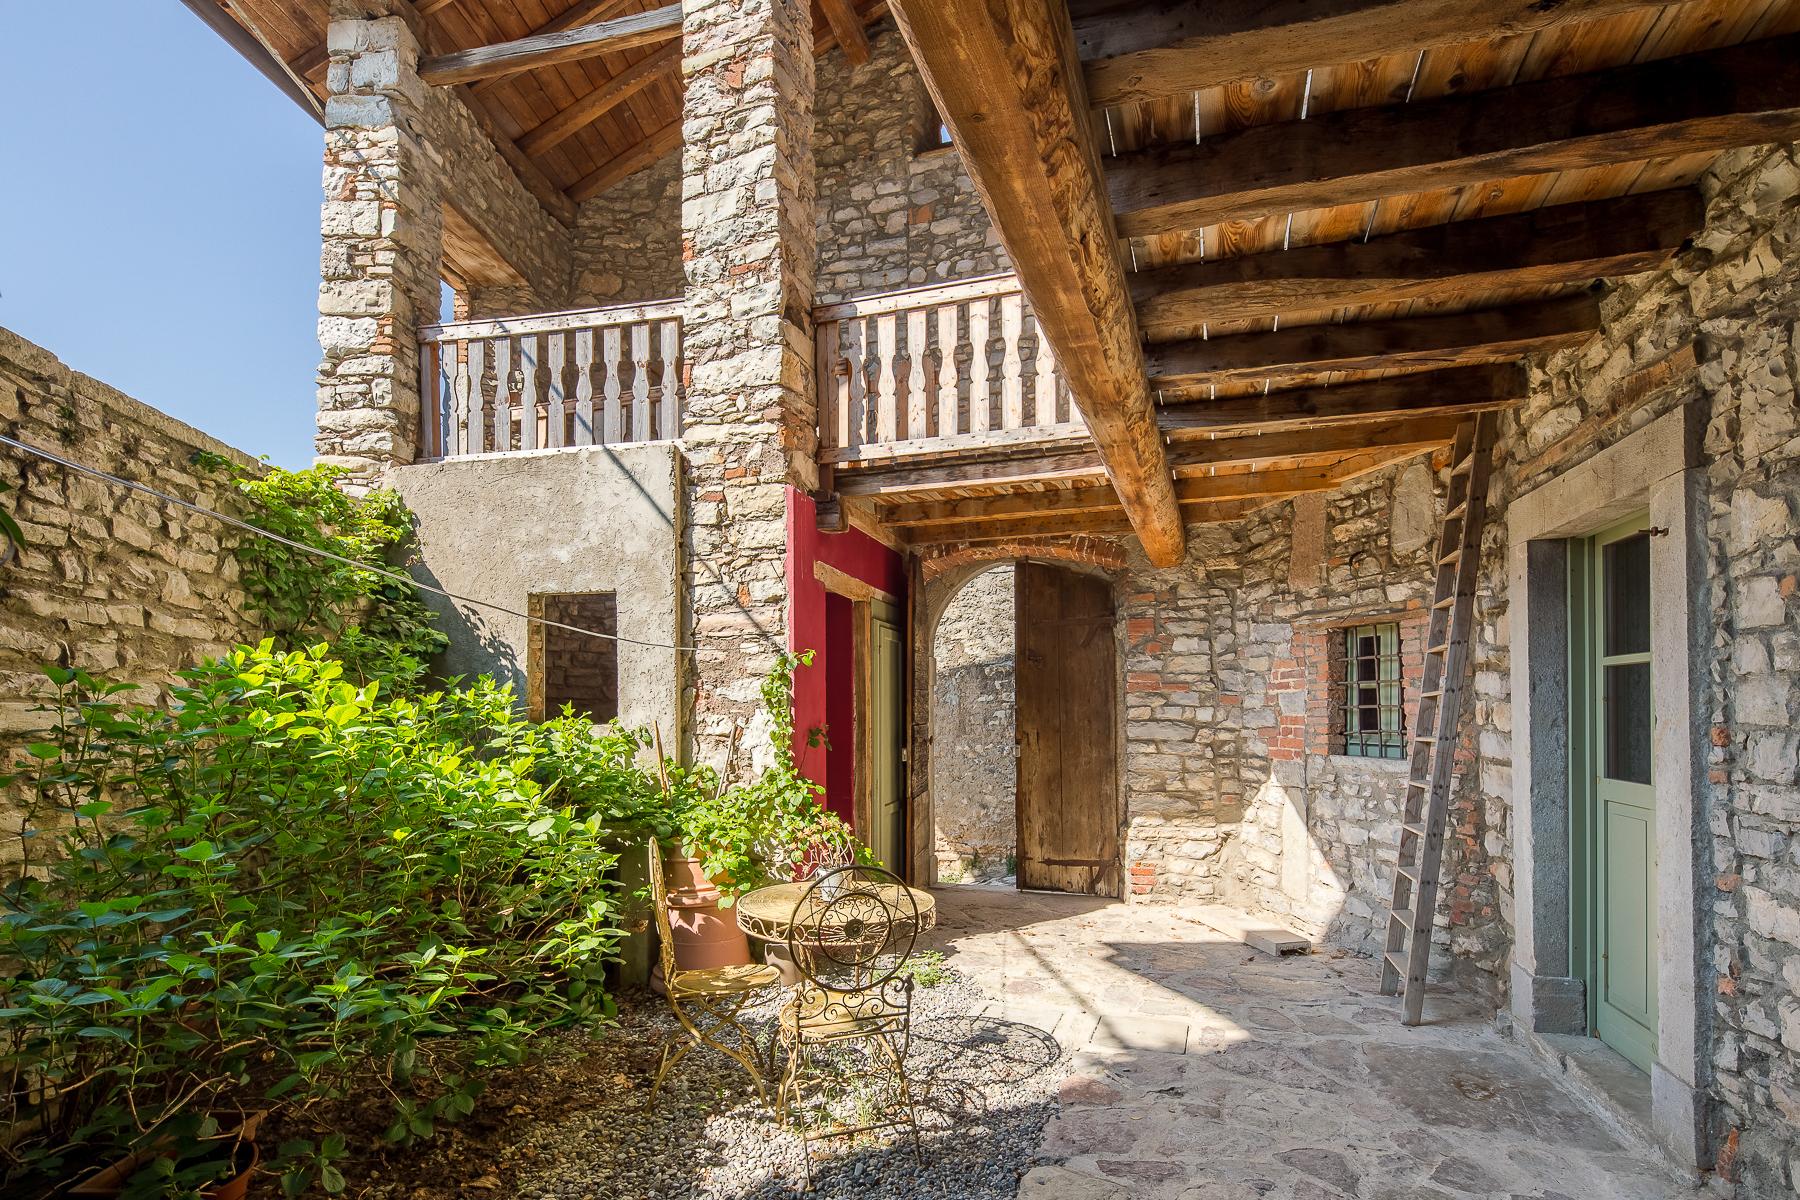 Casa indipendente in Vendita a Caprino Bergamasco: 5 locali, 500 mq - Foto 2